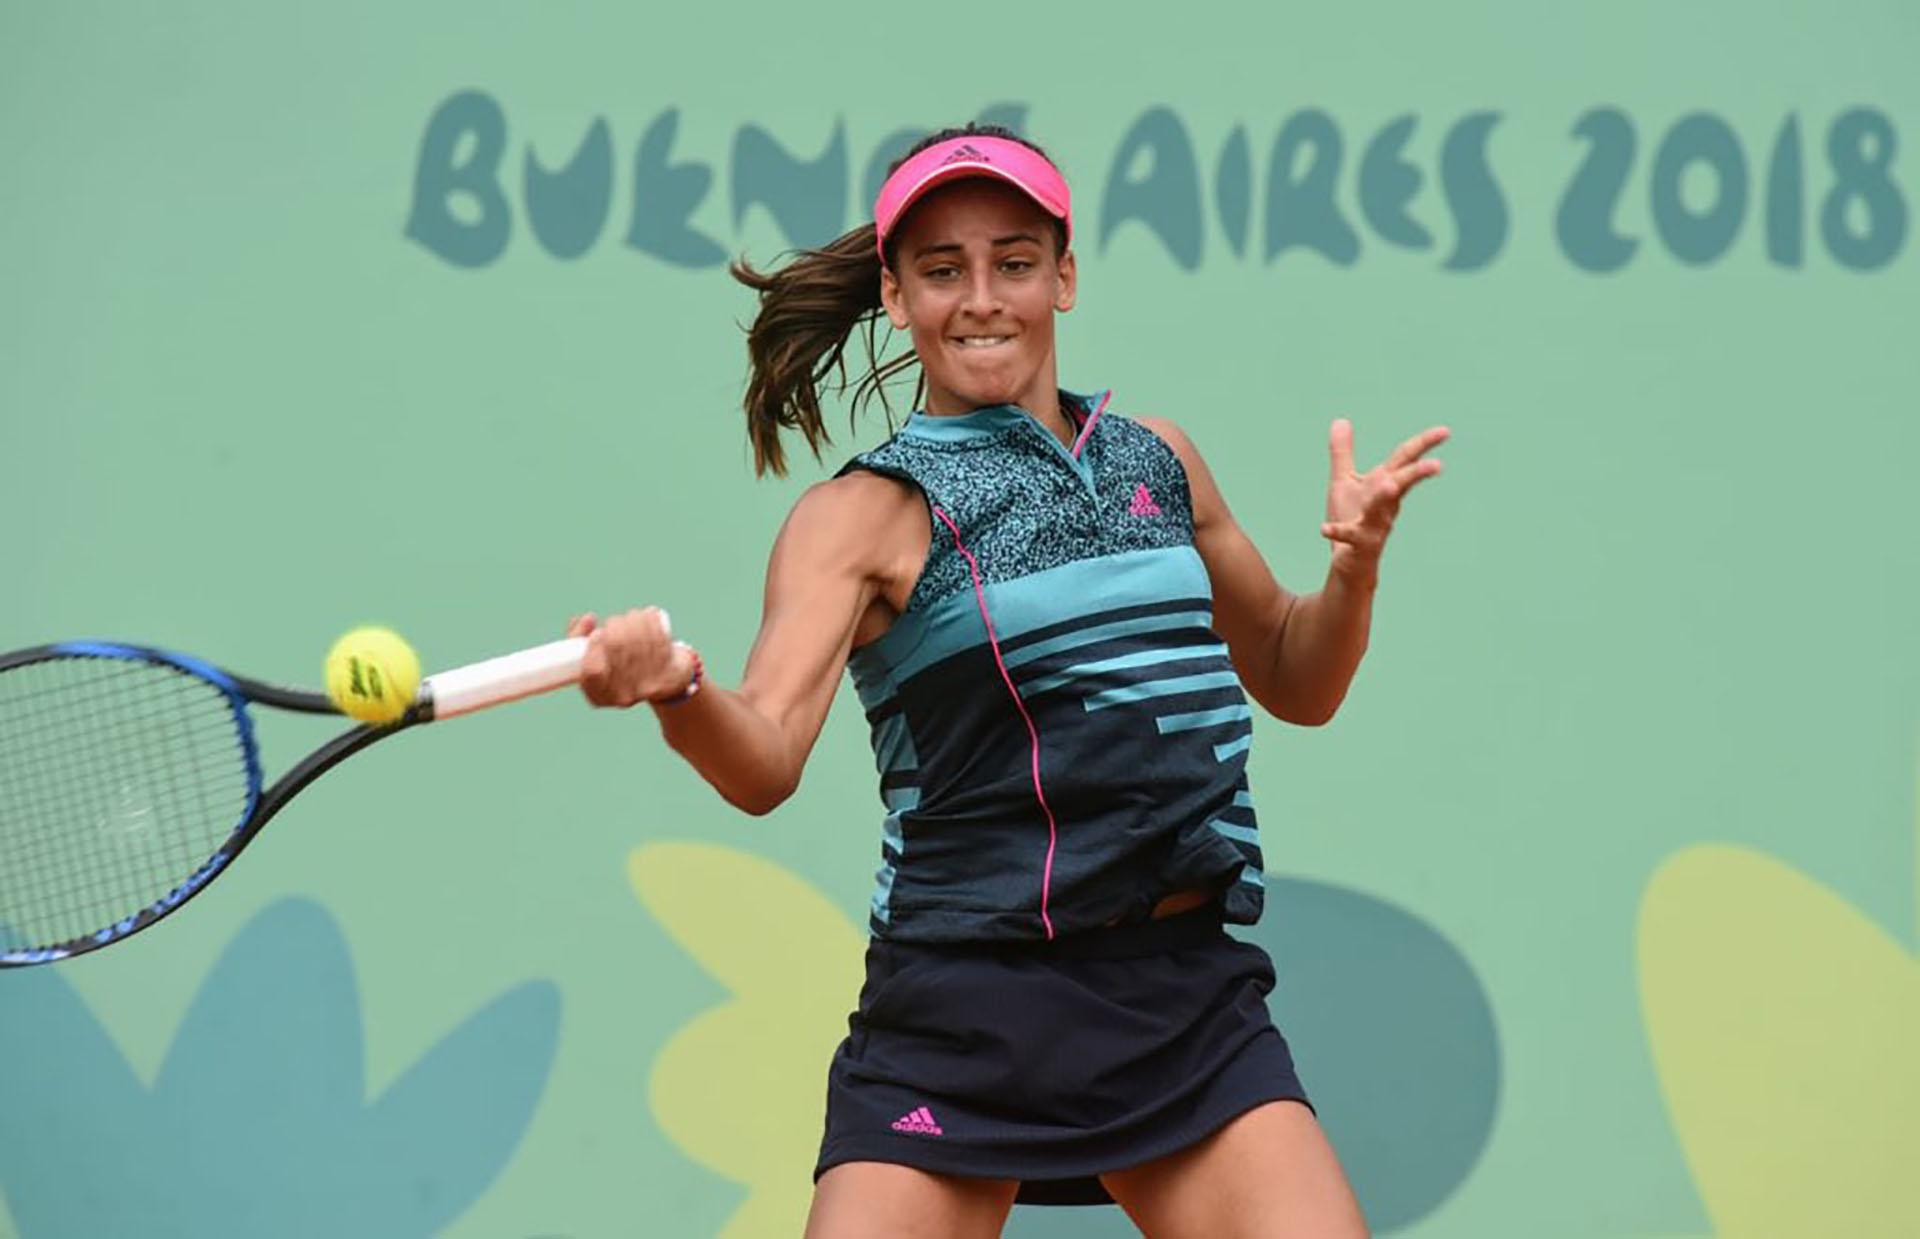 Ahora María Lourdes Carlé buscará la medalla de bronce (@PrensaCOA)